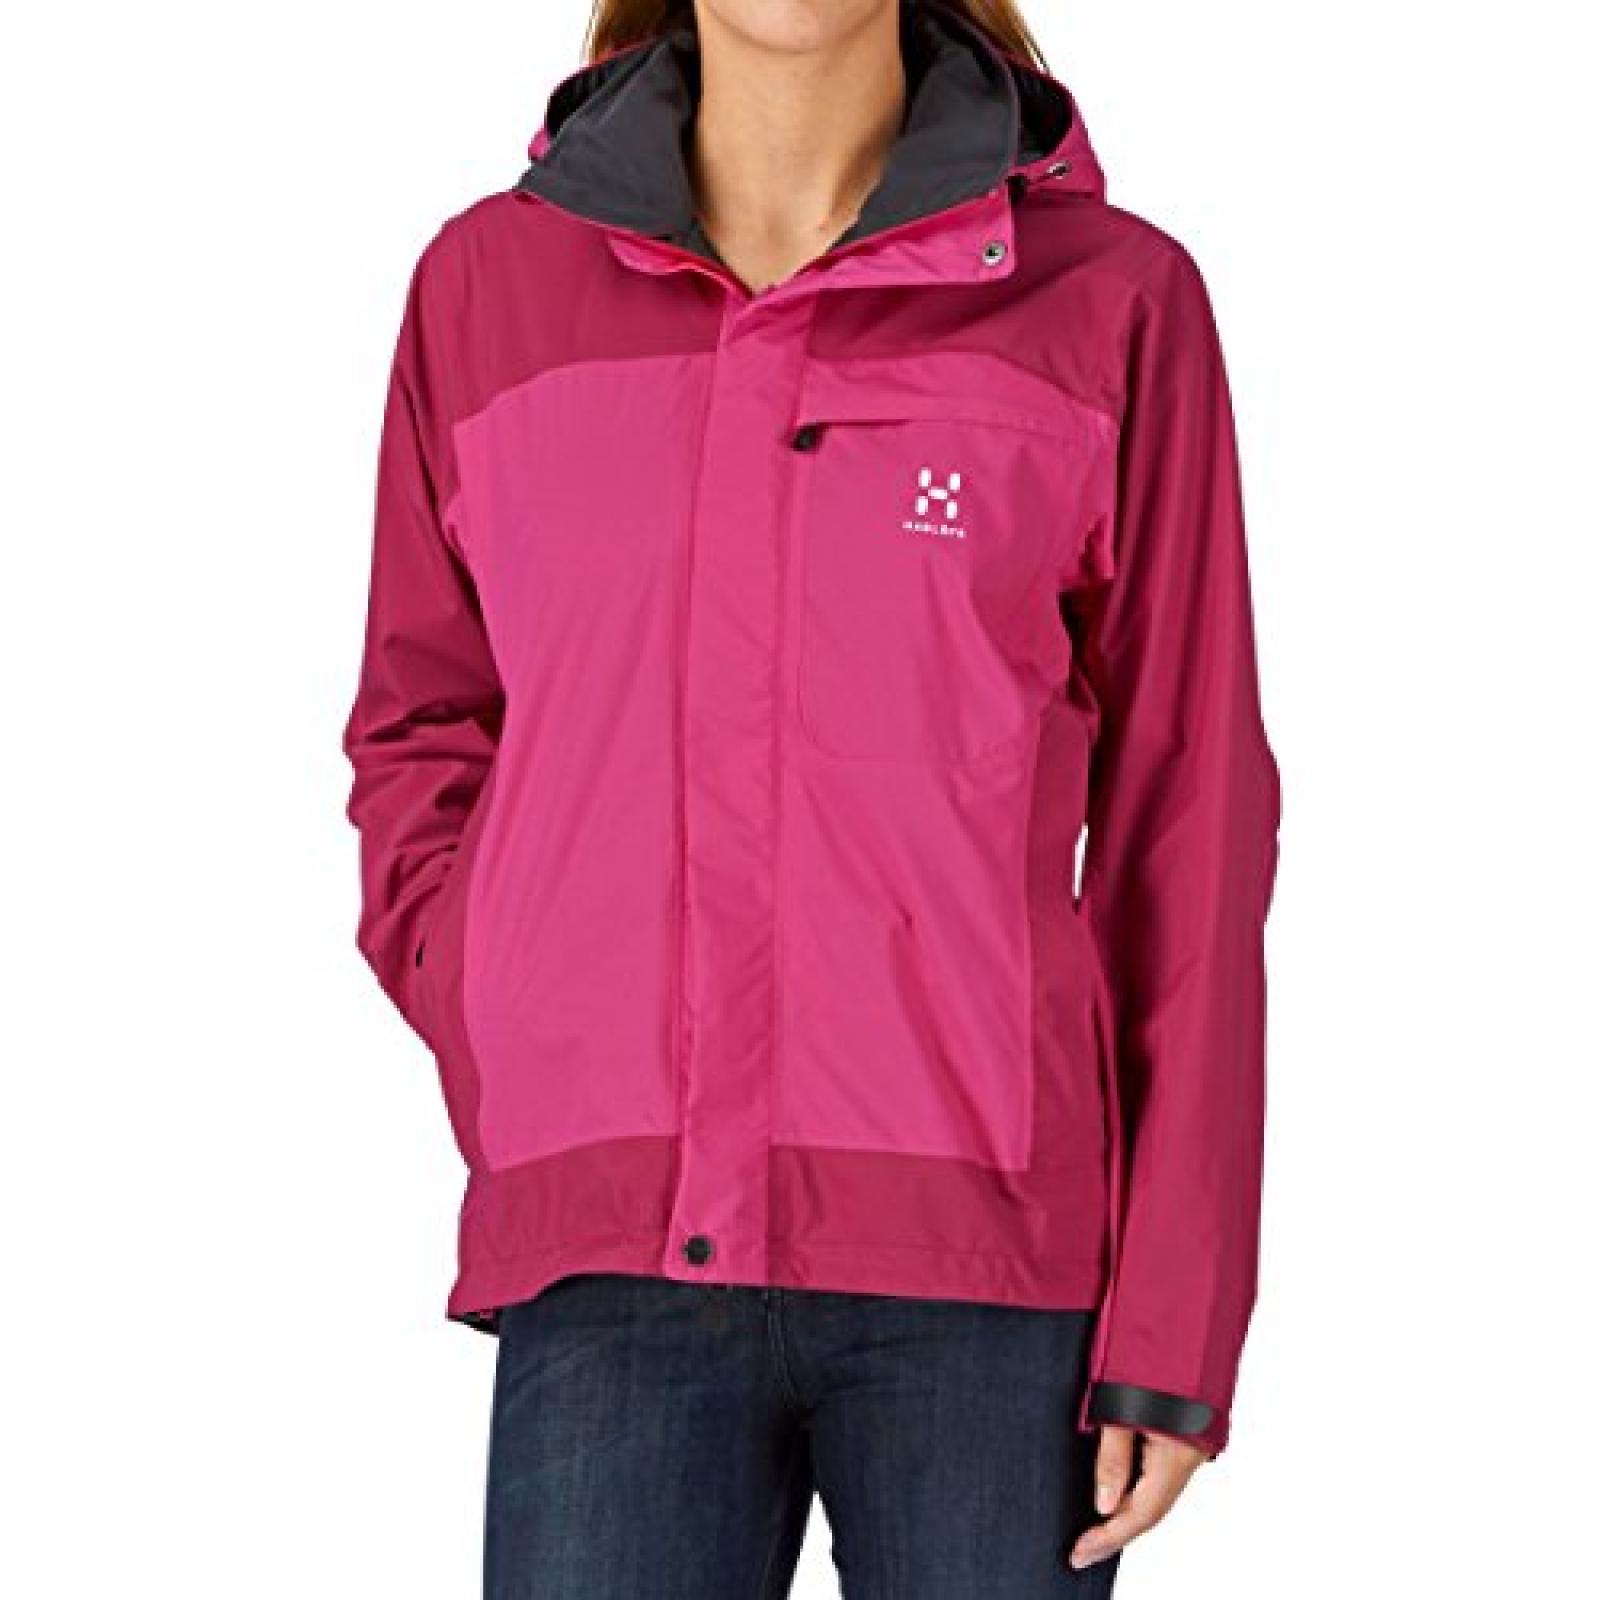 Haglofs Orion Ii Q Jacket - Cosmic Pink/volcanic Pink